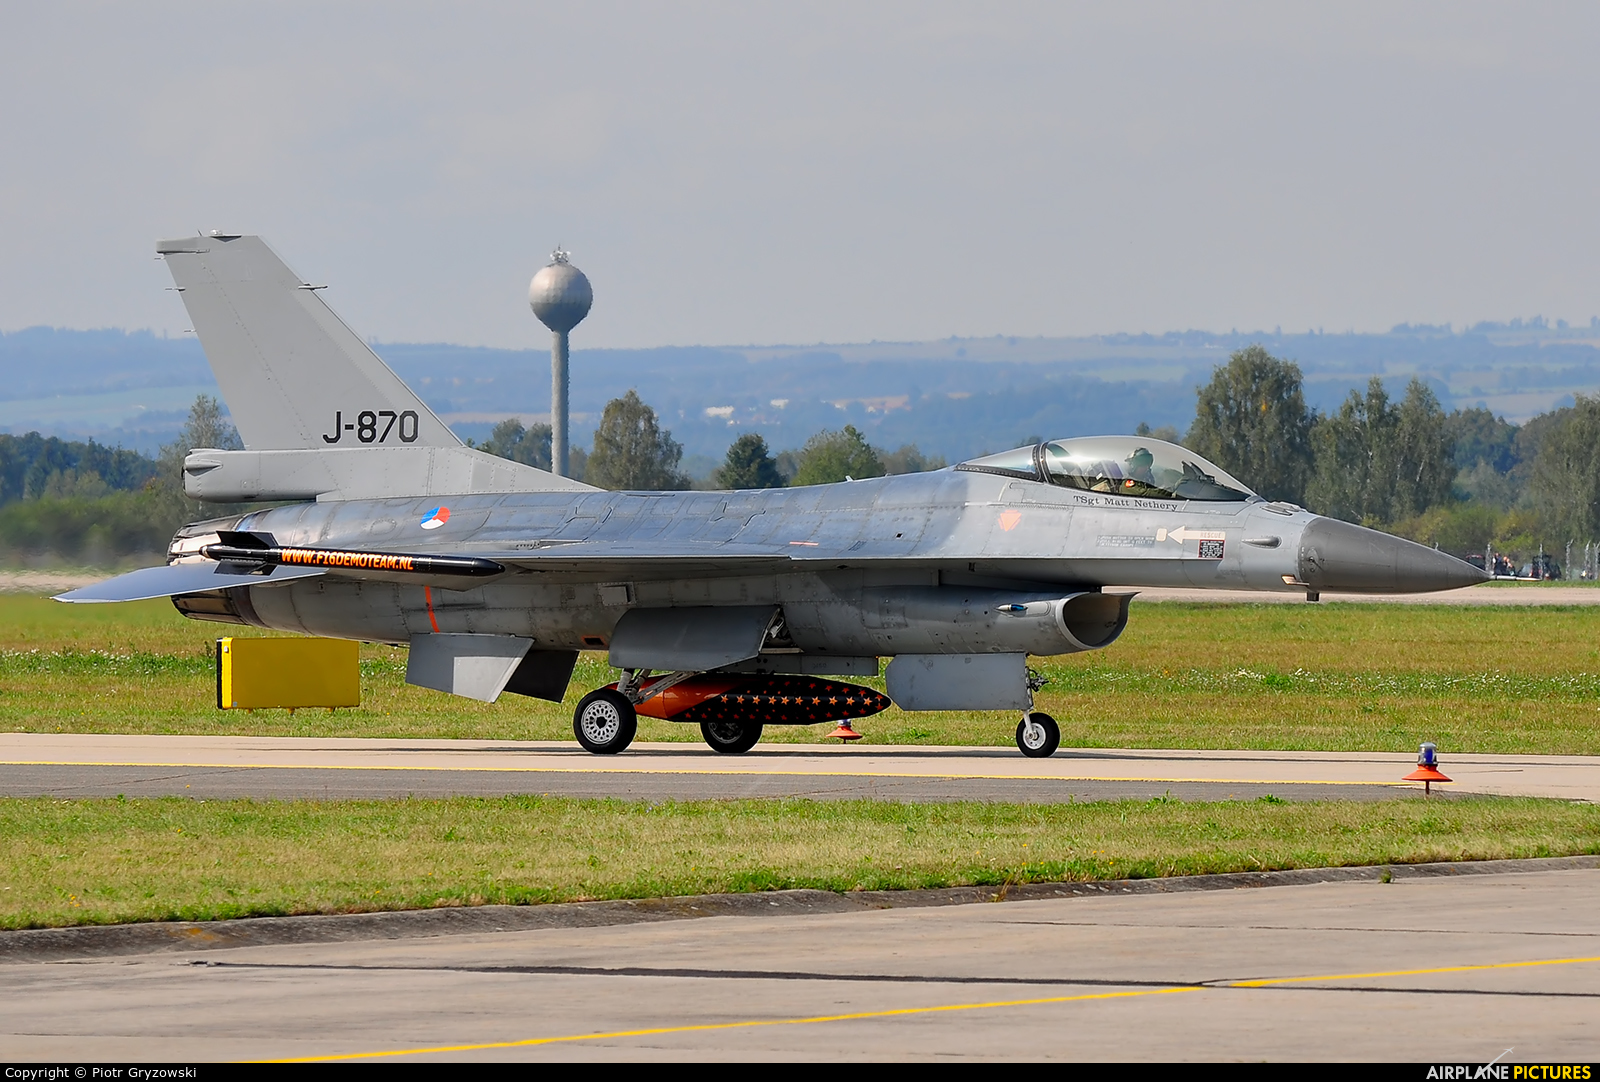 Netherlands - Air Force J-870 aircraft at Ostrava Mošnov